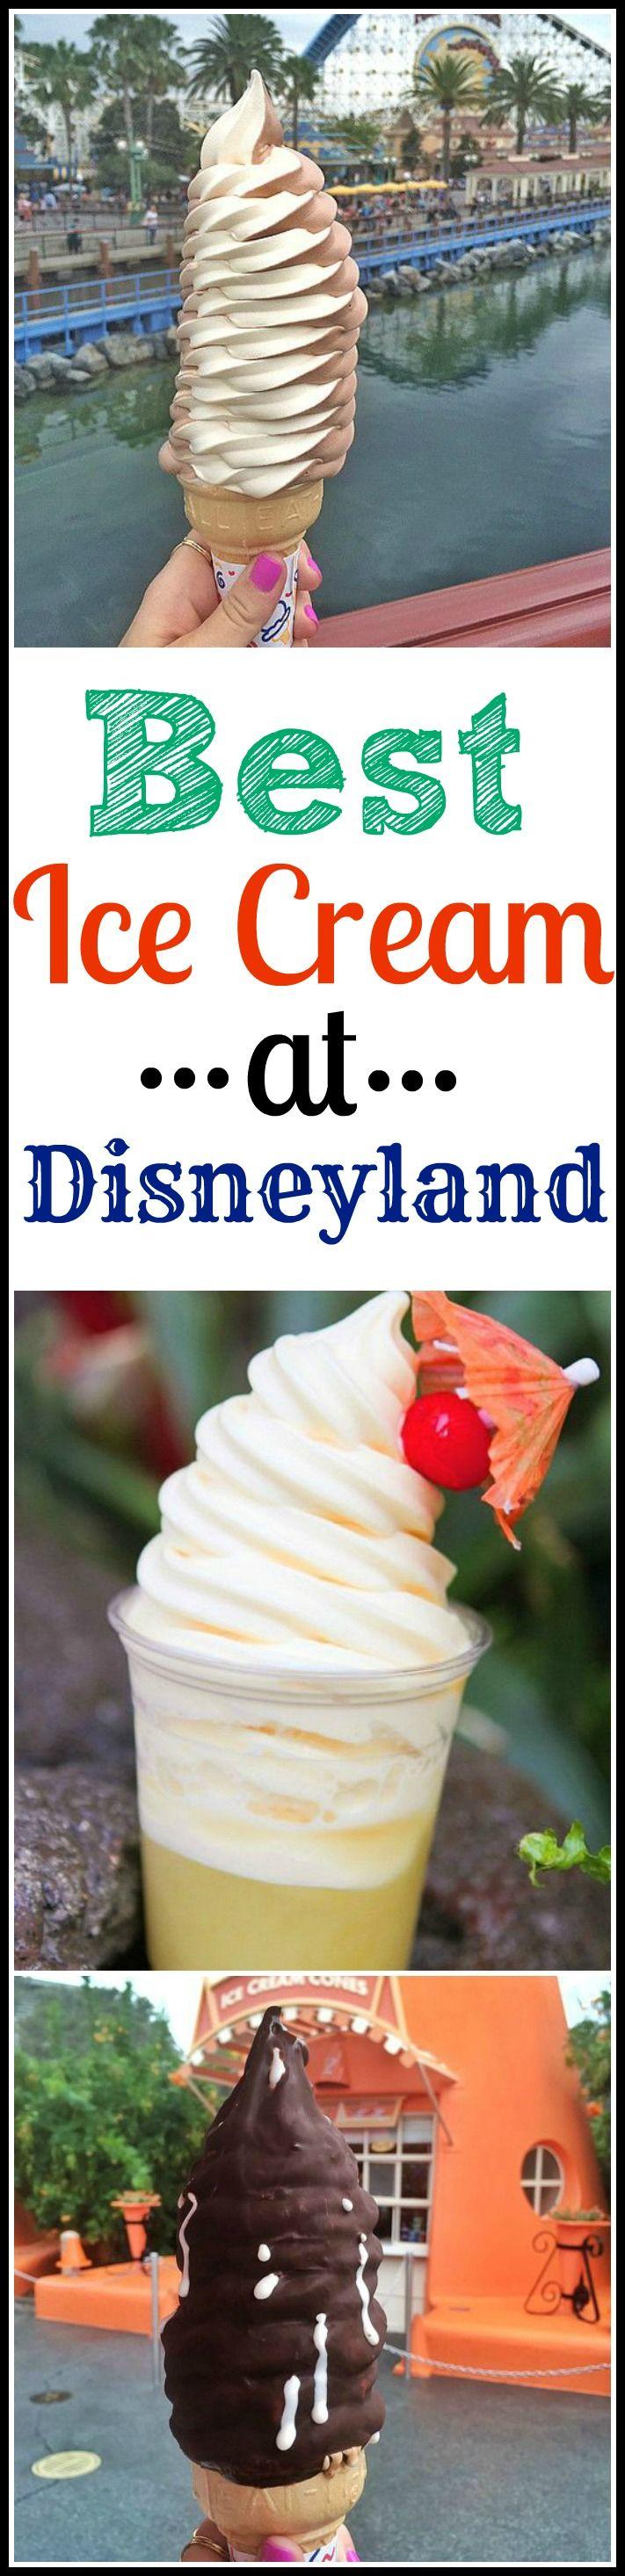 The Best Ice Cream at Disneyland Resort! #disneyland #icecream More Disneyland Resorts, Disneyland Thanksgiving, Disneyland 2017, Disney Dining, Disneyland Trips, Beautiful Places, Ice Cream, Roads Trips, Disneyland Icecream